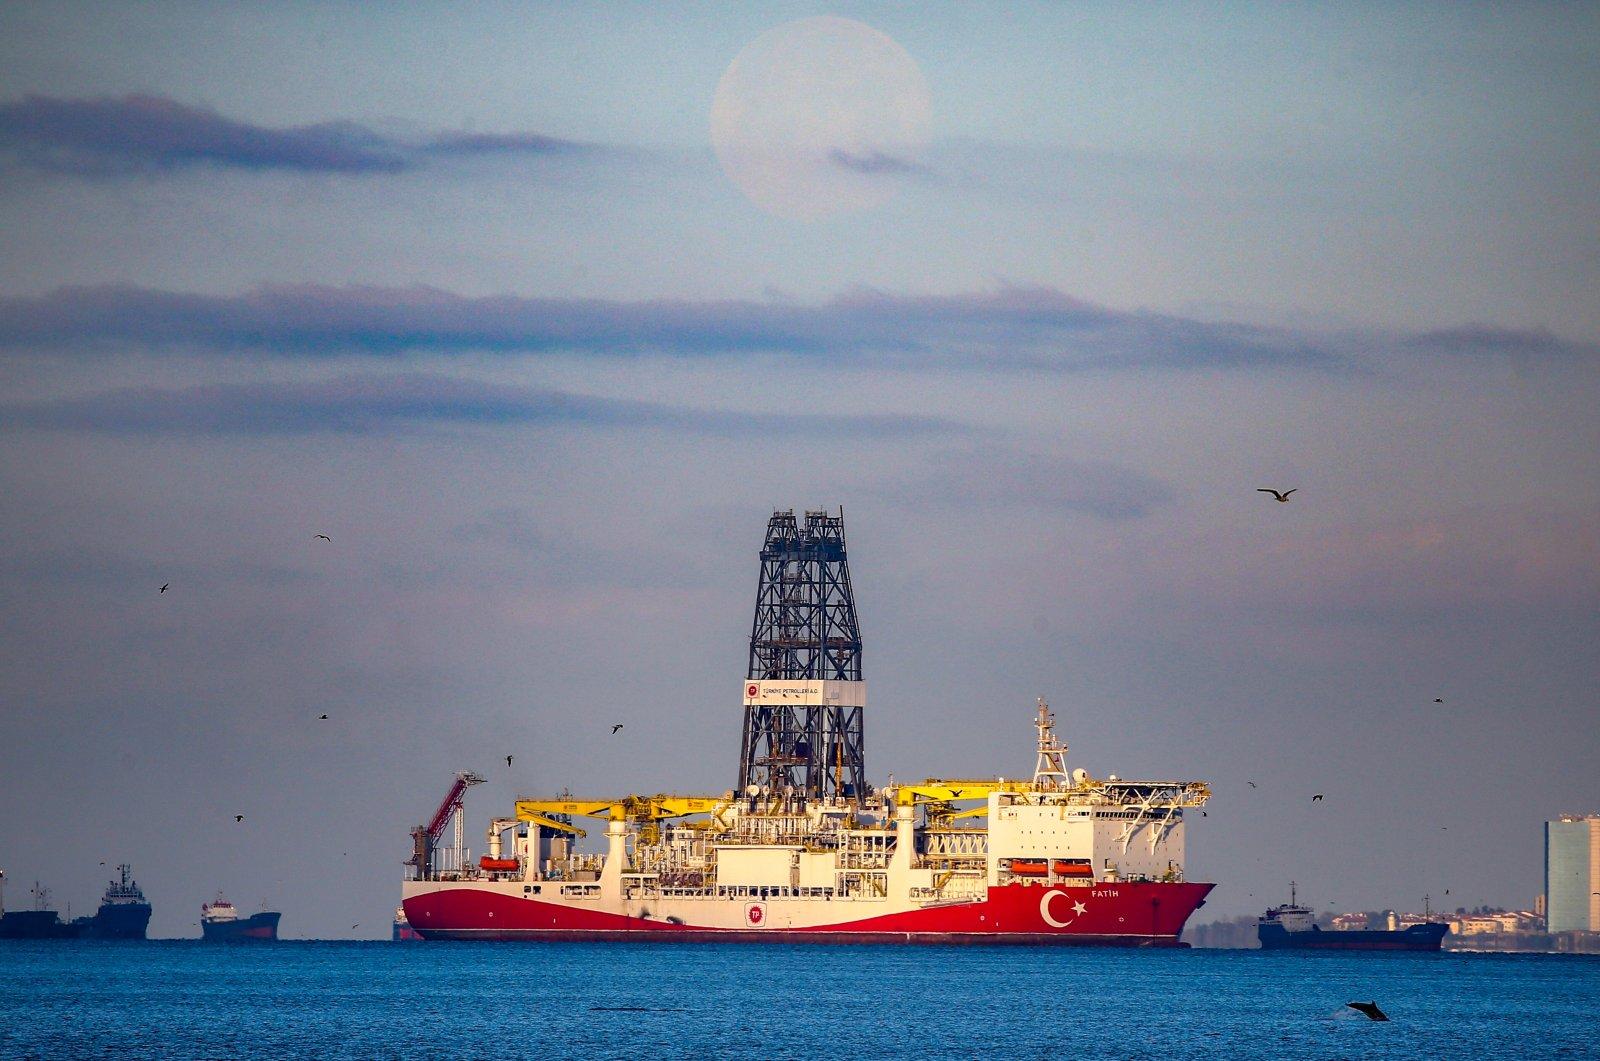 Turkey's Fatih drillship seen off the shores of Istanbul, Turkey, April 9, 2020. (AA Photo)